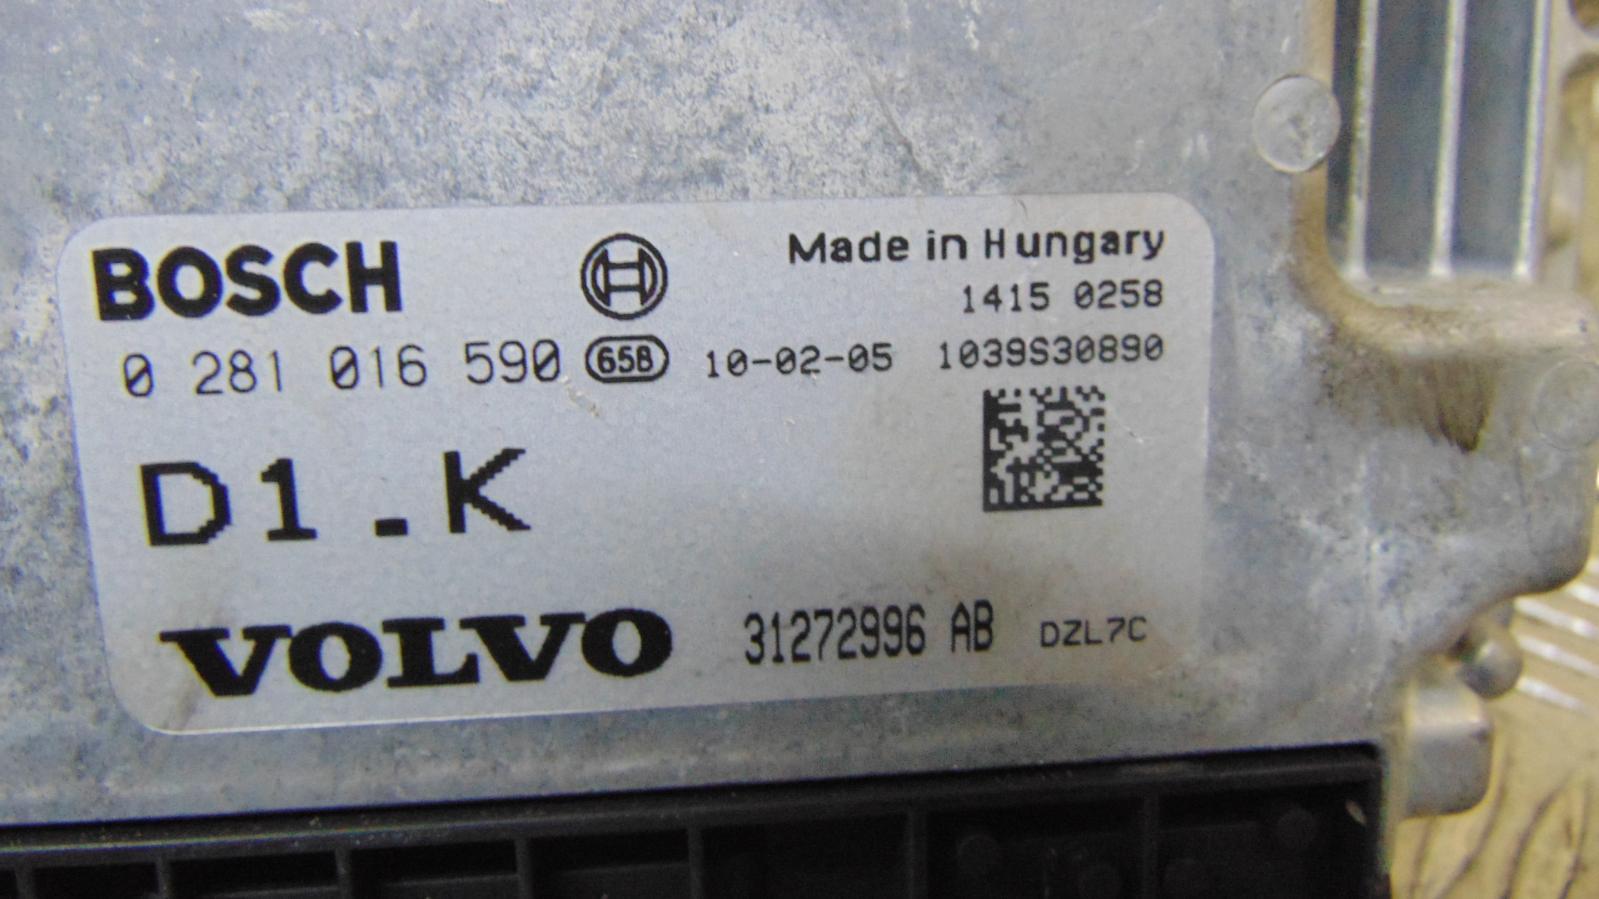 Volvo V50 Ecu Mk1 16 Diesel Engine Ecuspeedometerbcm Fusebox 2004 Fuse Box Location 2 Of 10 2012